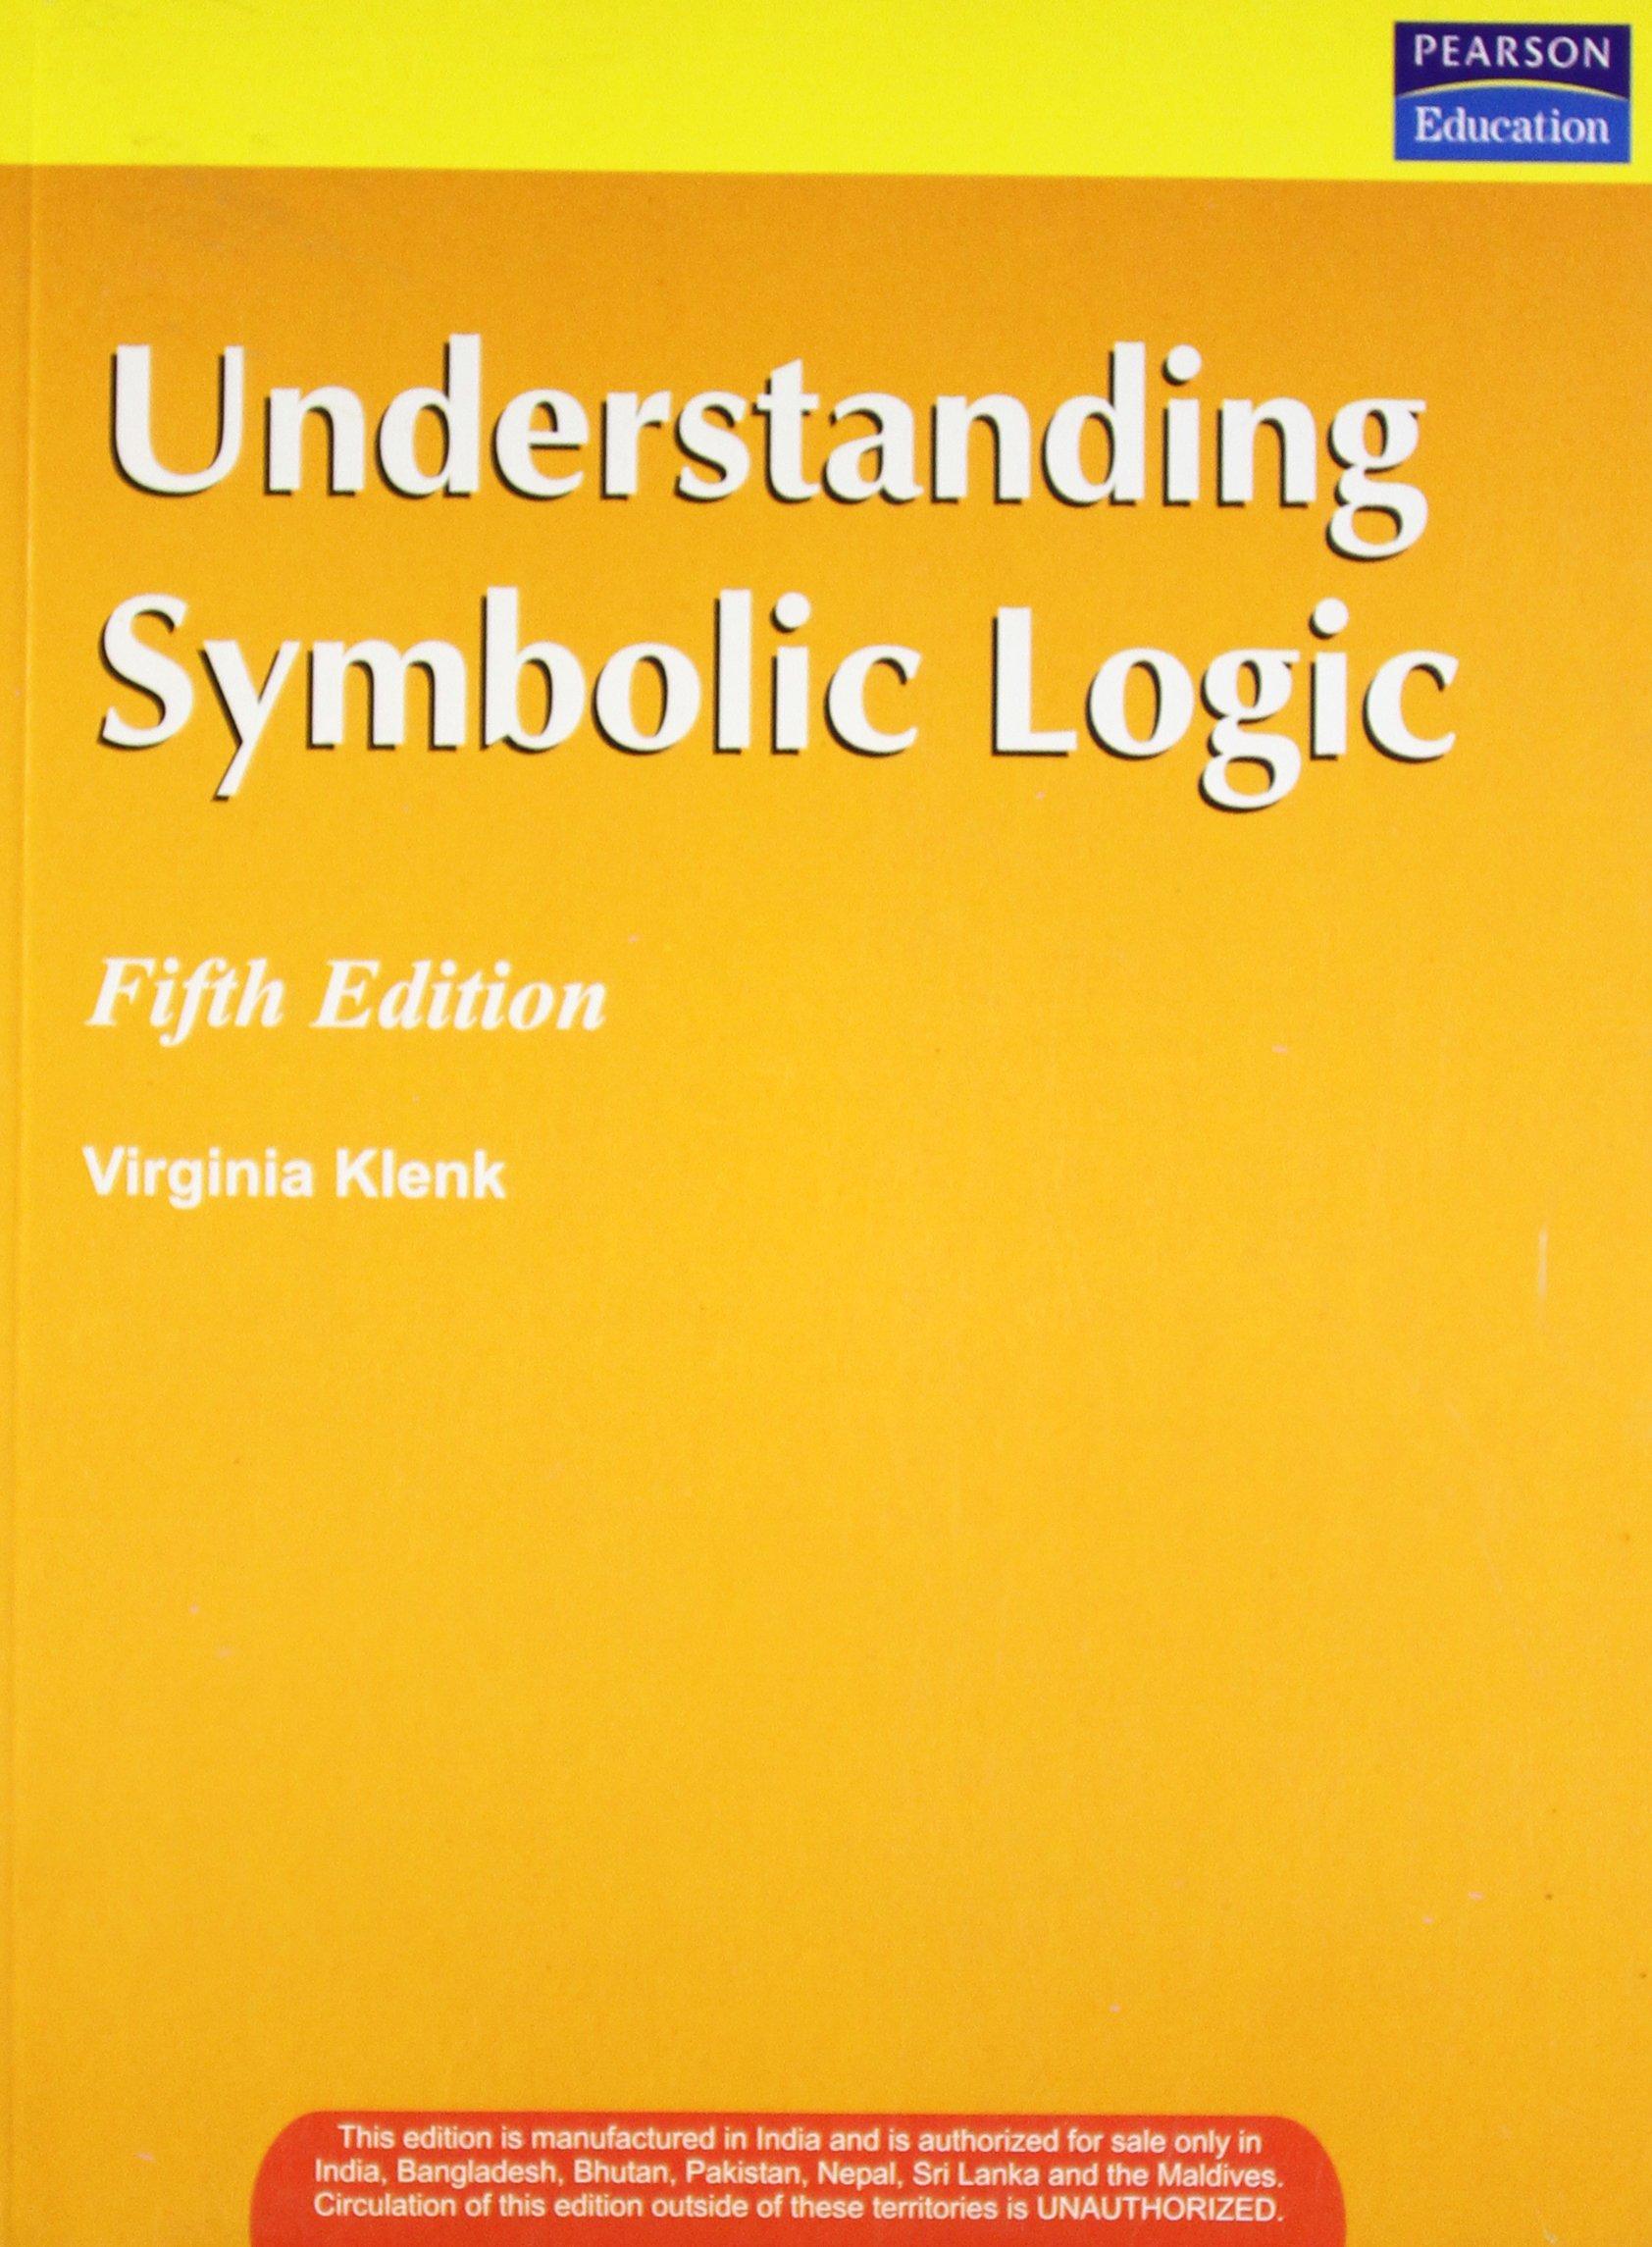 Understanding Symbolic Logic International Edition 9788131723579